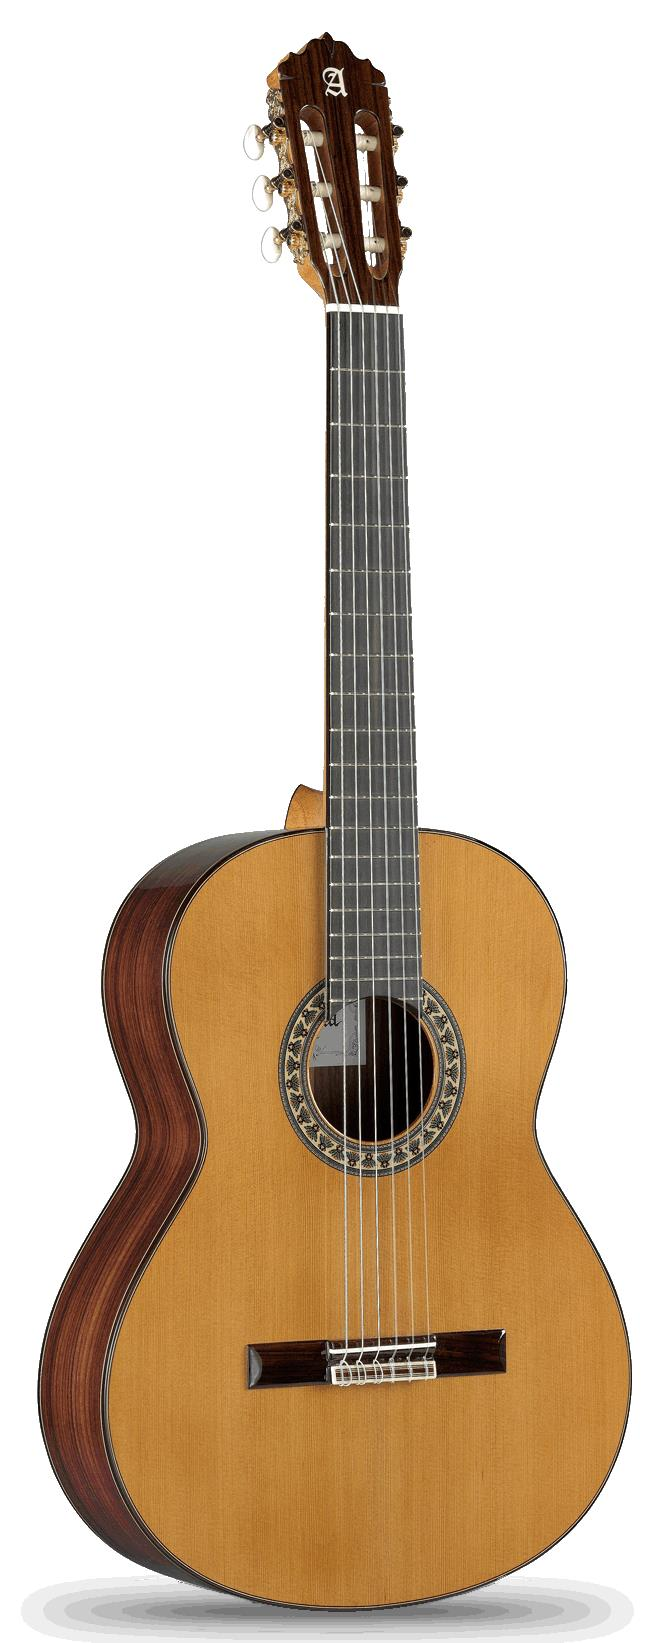 Классическая гитара ALHAMBRA 6.209 CLASSICAL CONSERVATORY 5P A